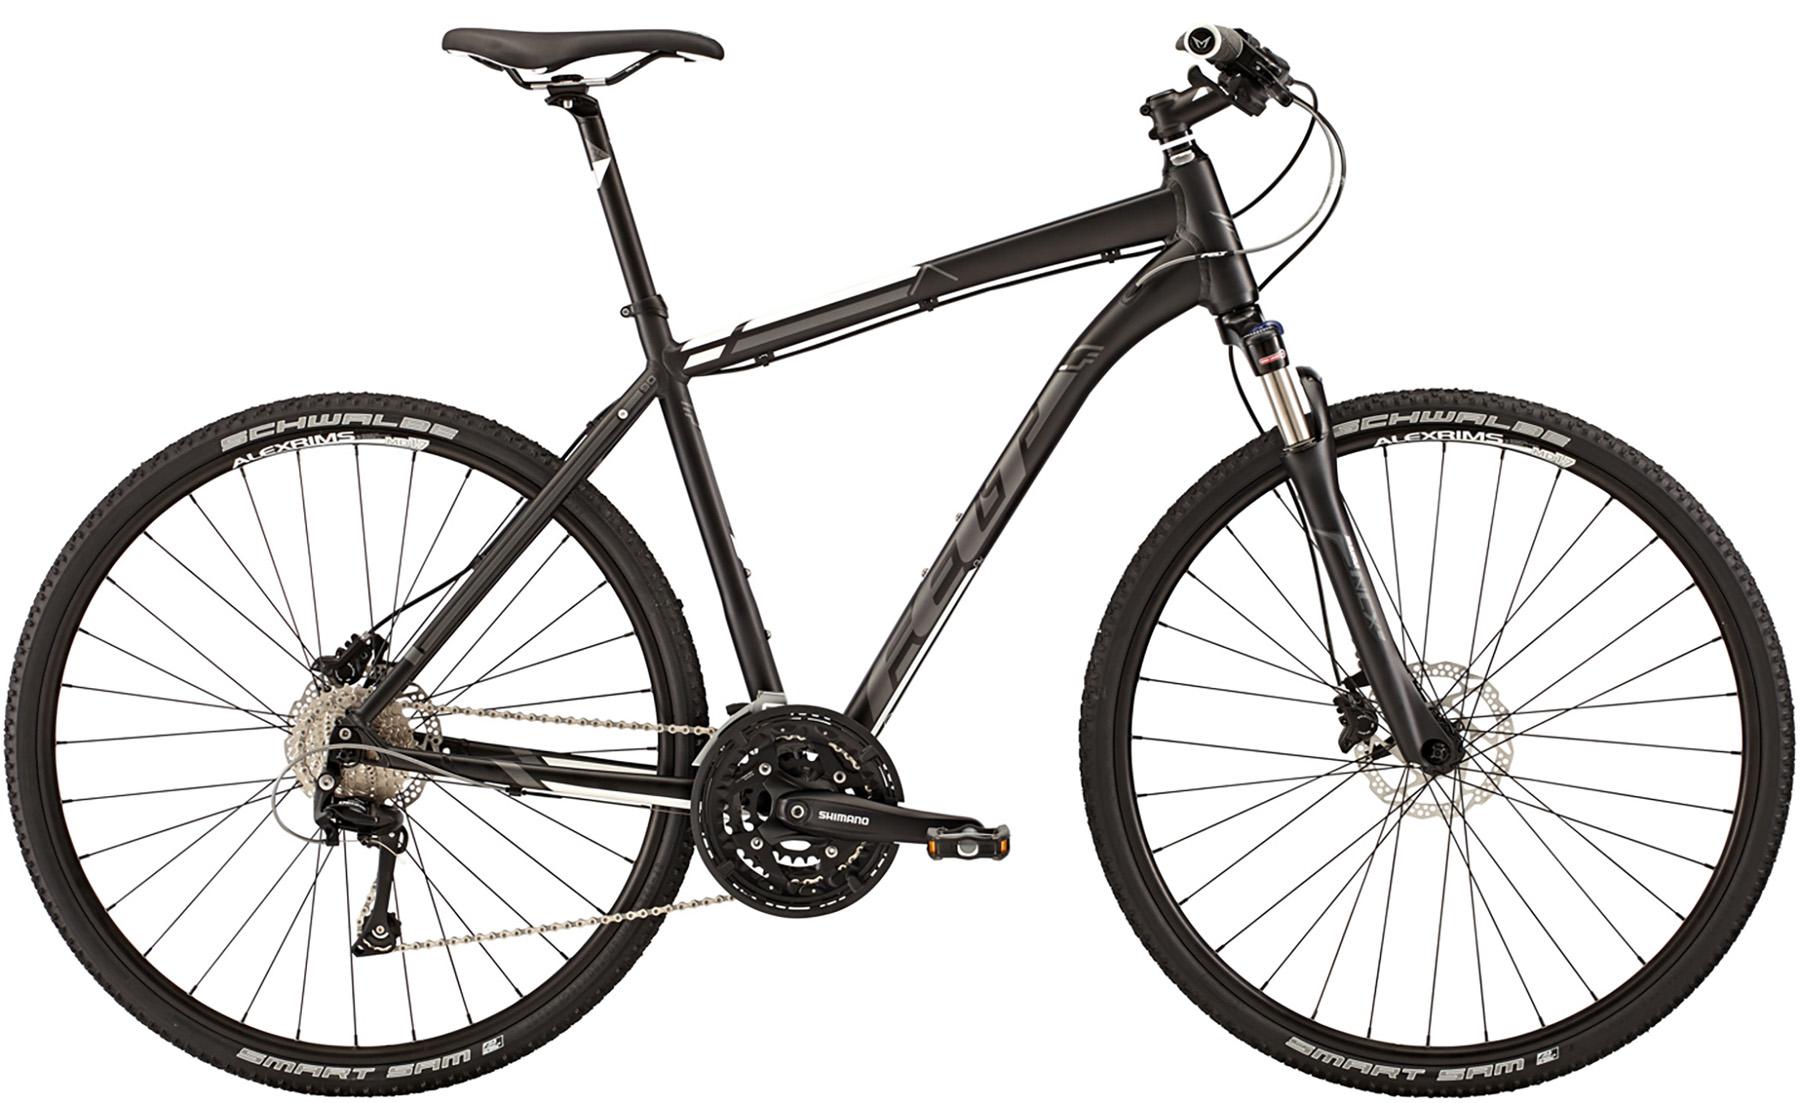 "Pánské trekové kolo FELT QX 90 2015 + cyklovýbava BSB-51 za 799 Kč zdarma černá, 22"", 55 cm"